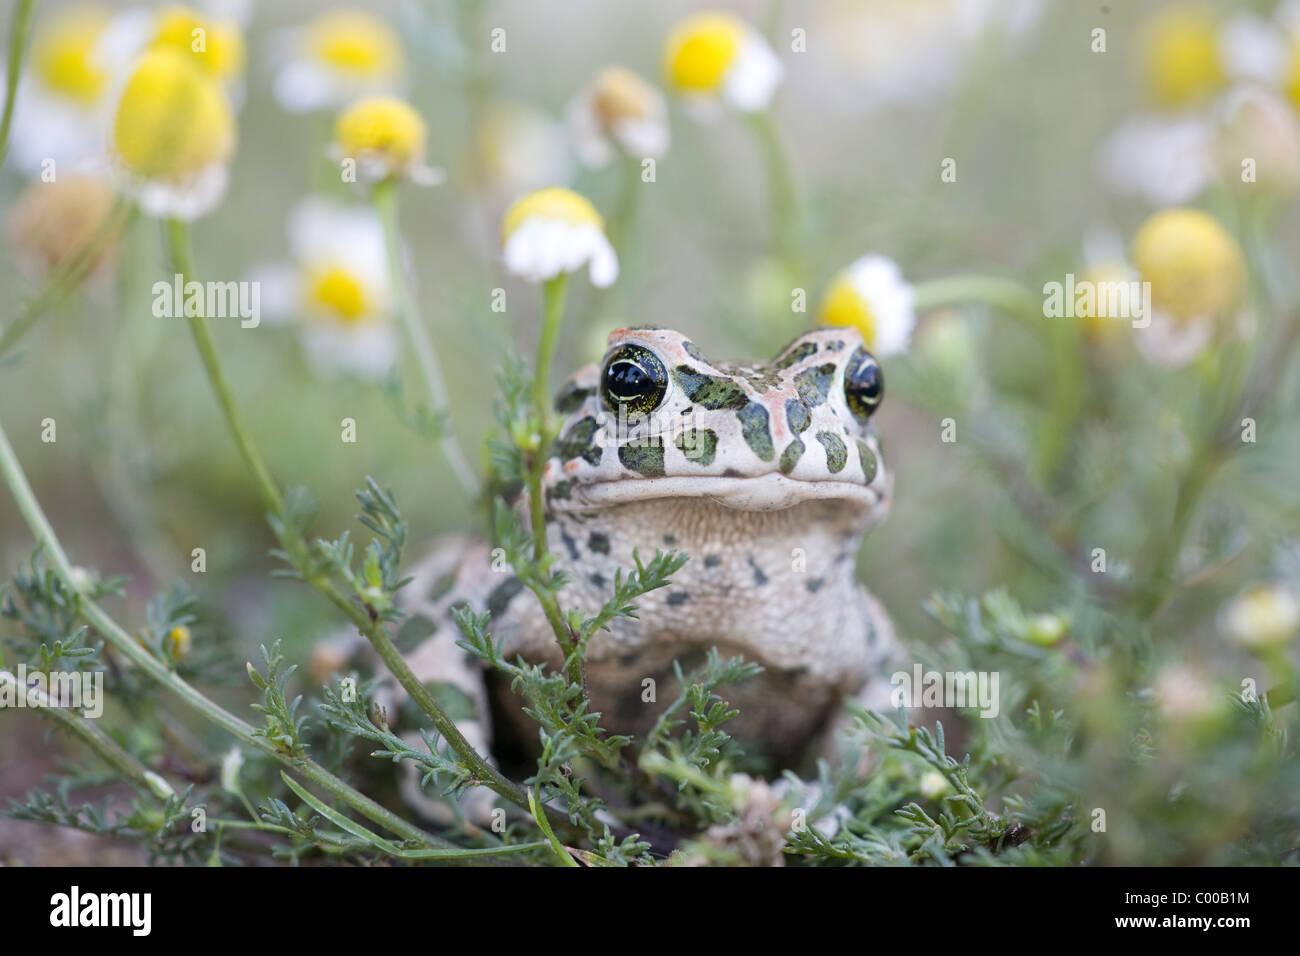 (European) green toad [Bufo viridis] - Stock Image